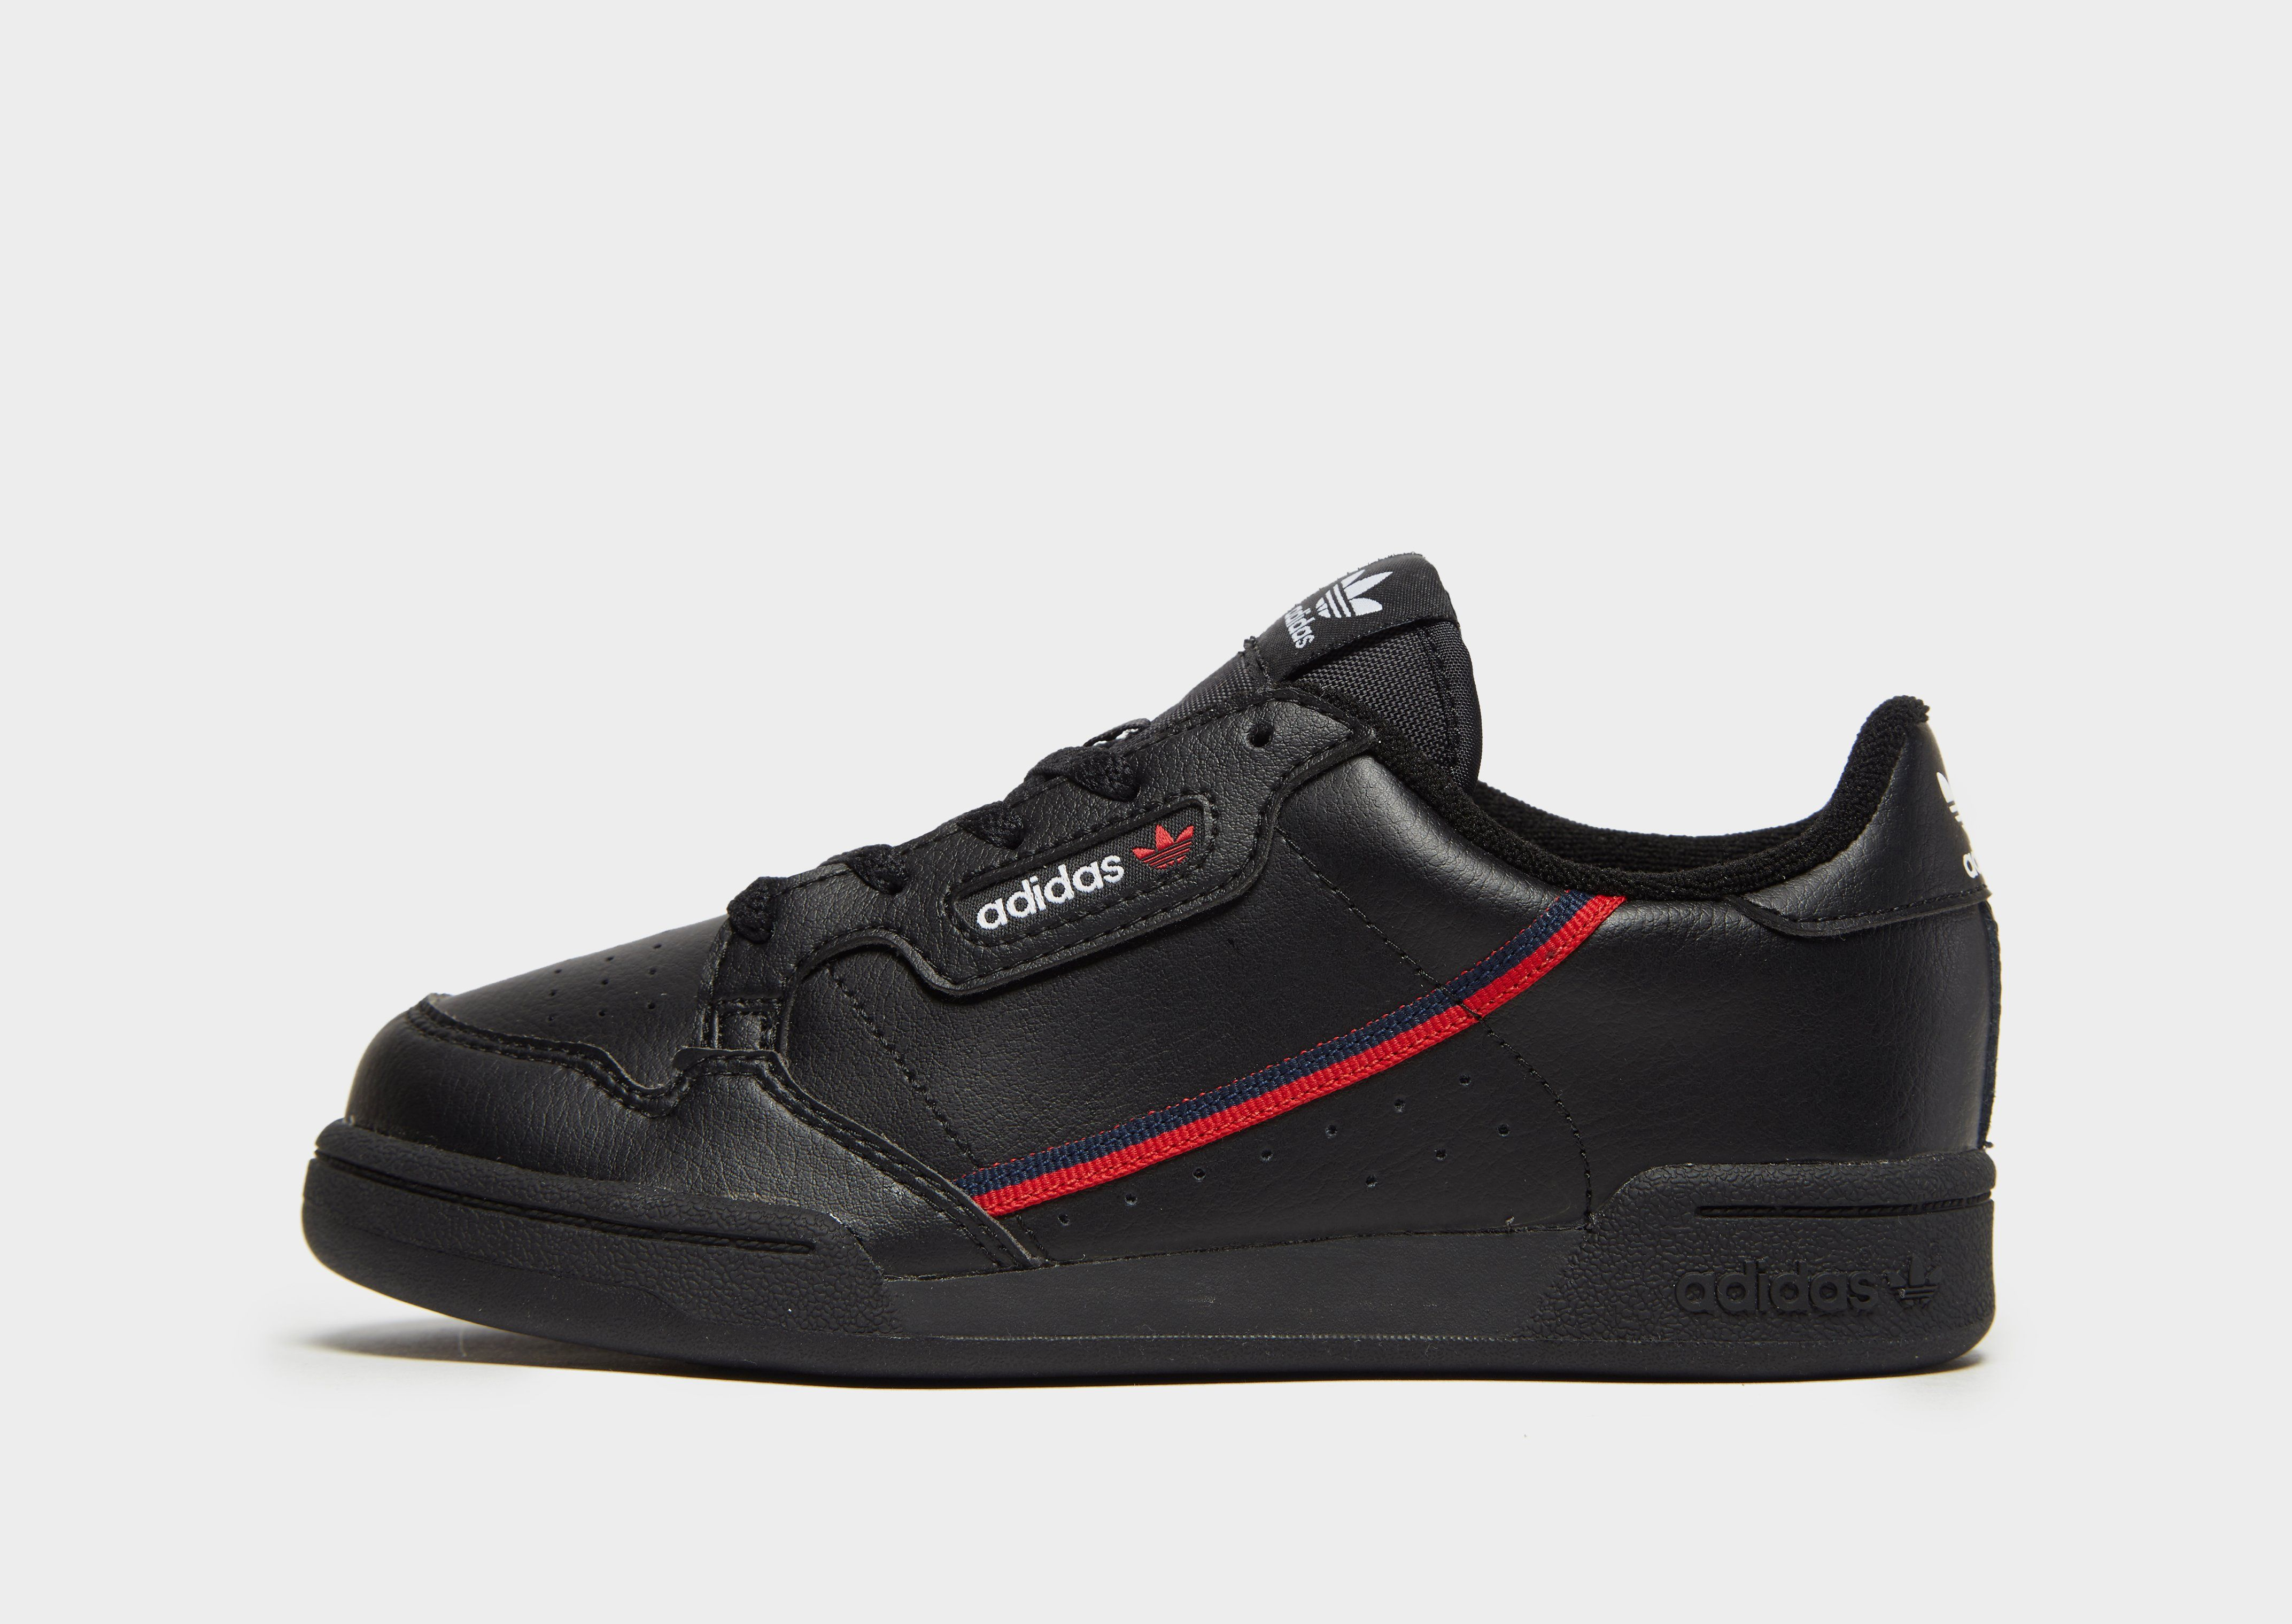 0dab588cfdf88 ADIDAS Continental 80 Shoes